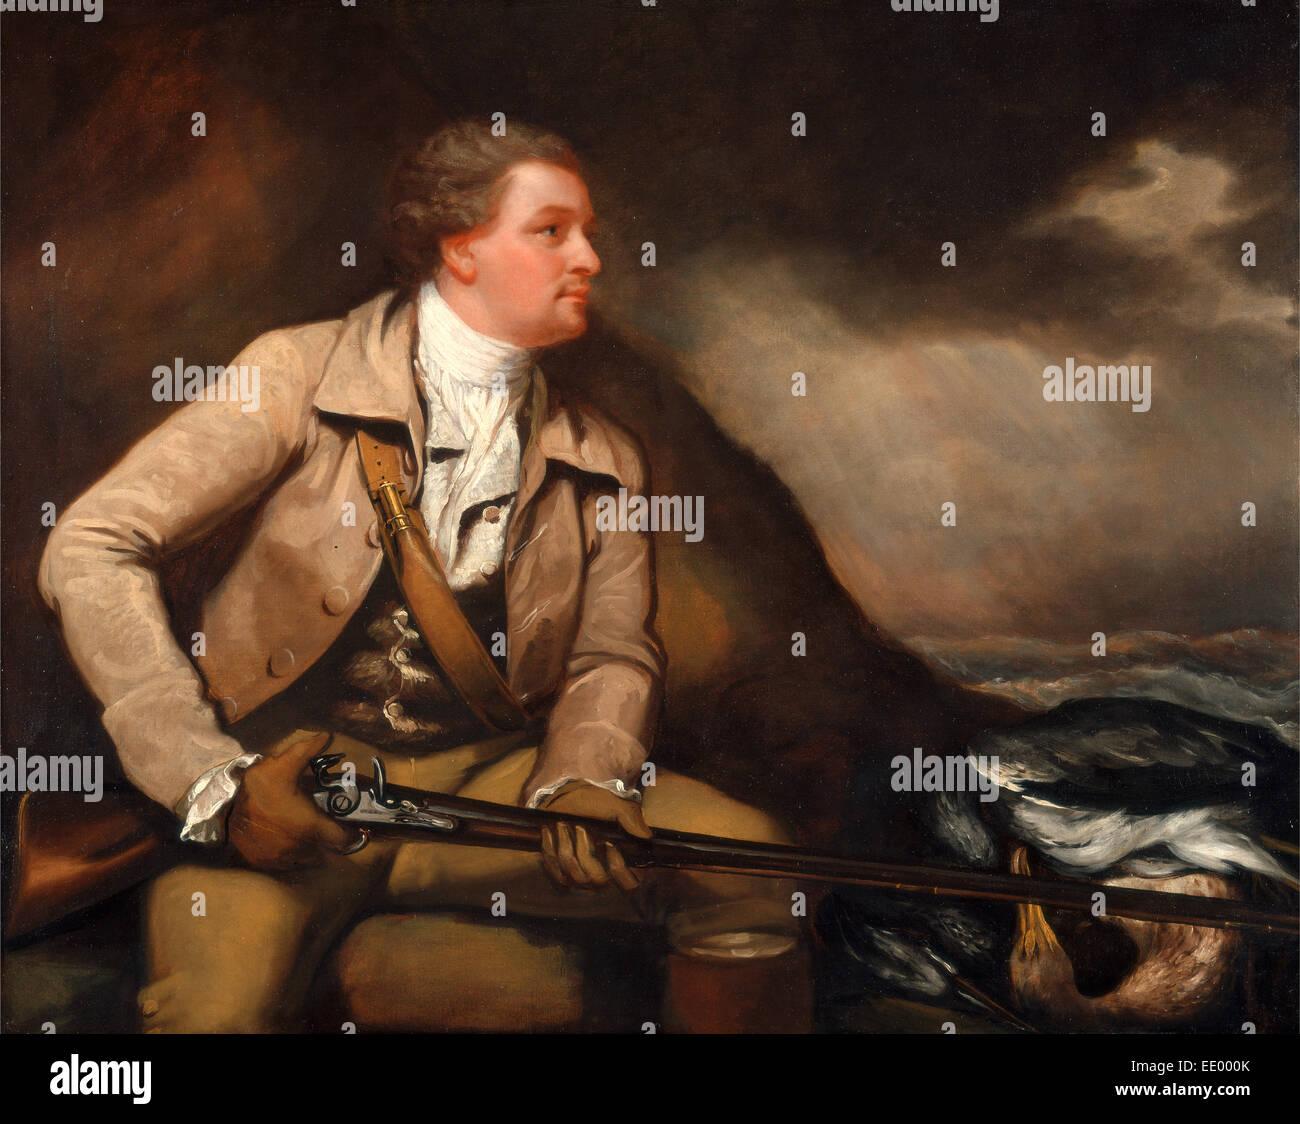 Sir William Elford, Bart. William Elford Heron-Shooting in Devon, James Northcote, 1746-1831, British - Stock Image